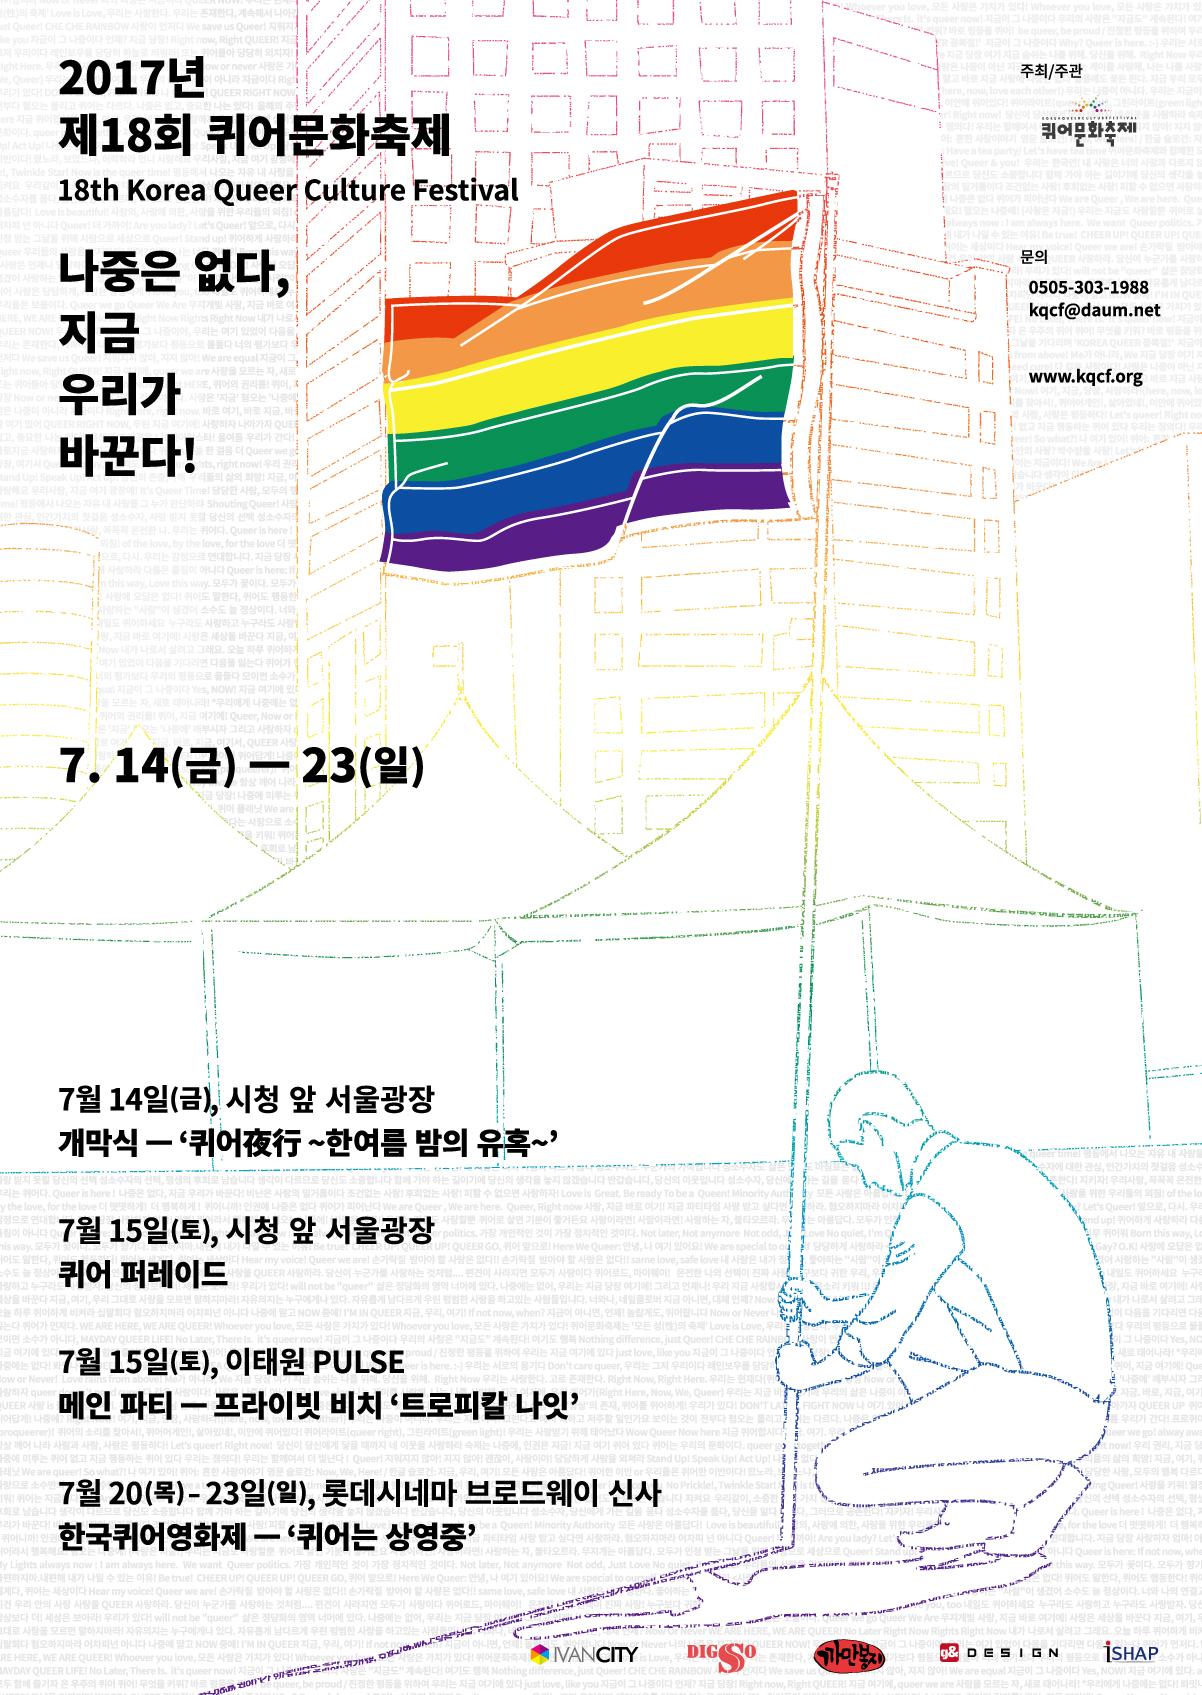 KQCF-2017-메인-포스터_최종.jpg